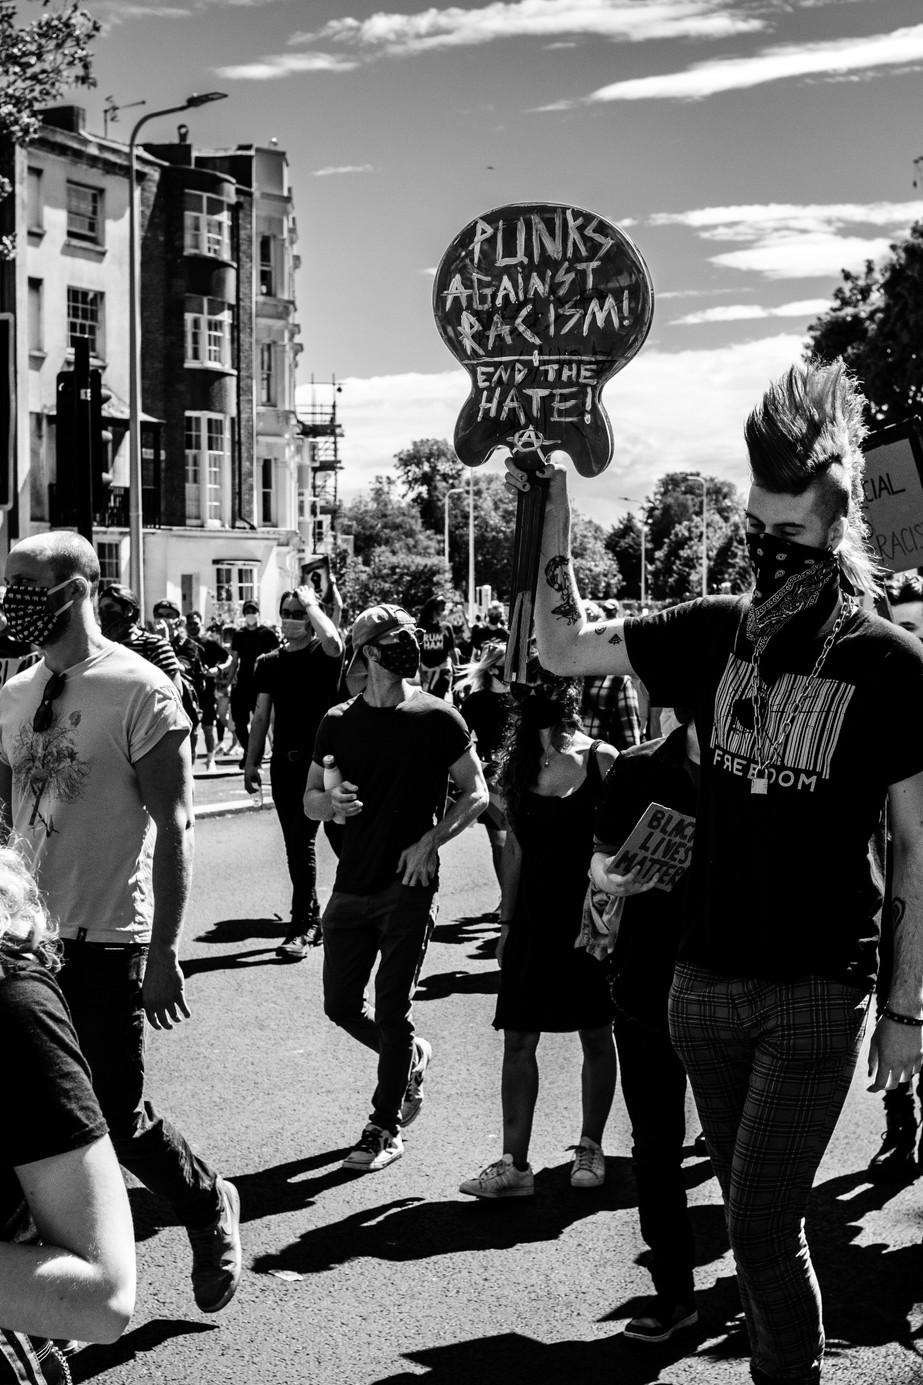 BLM - Punks against Racism II